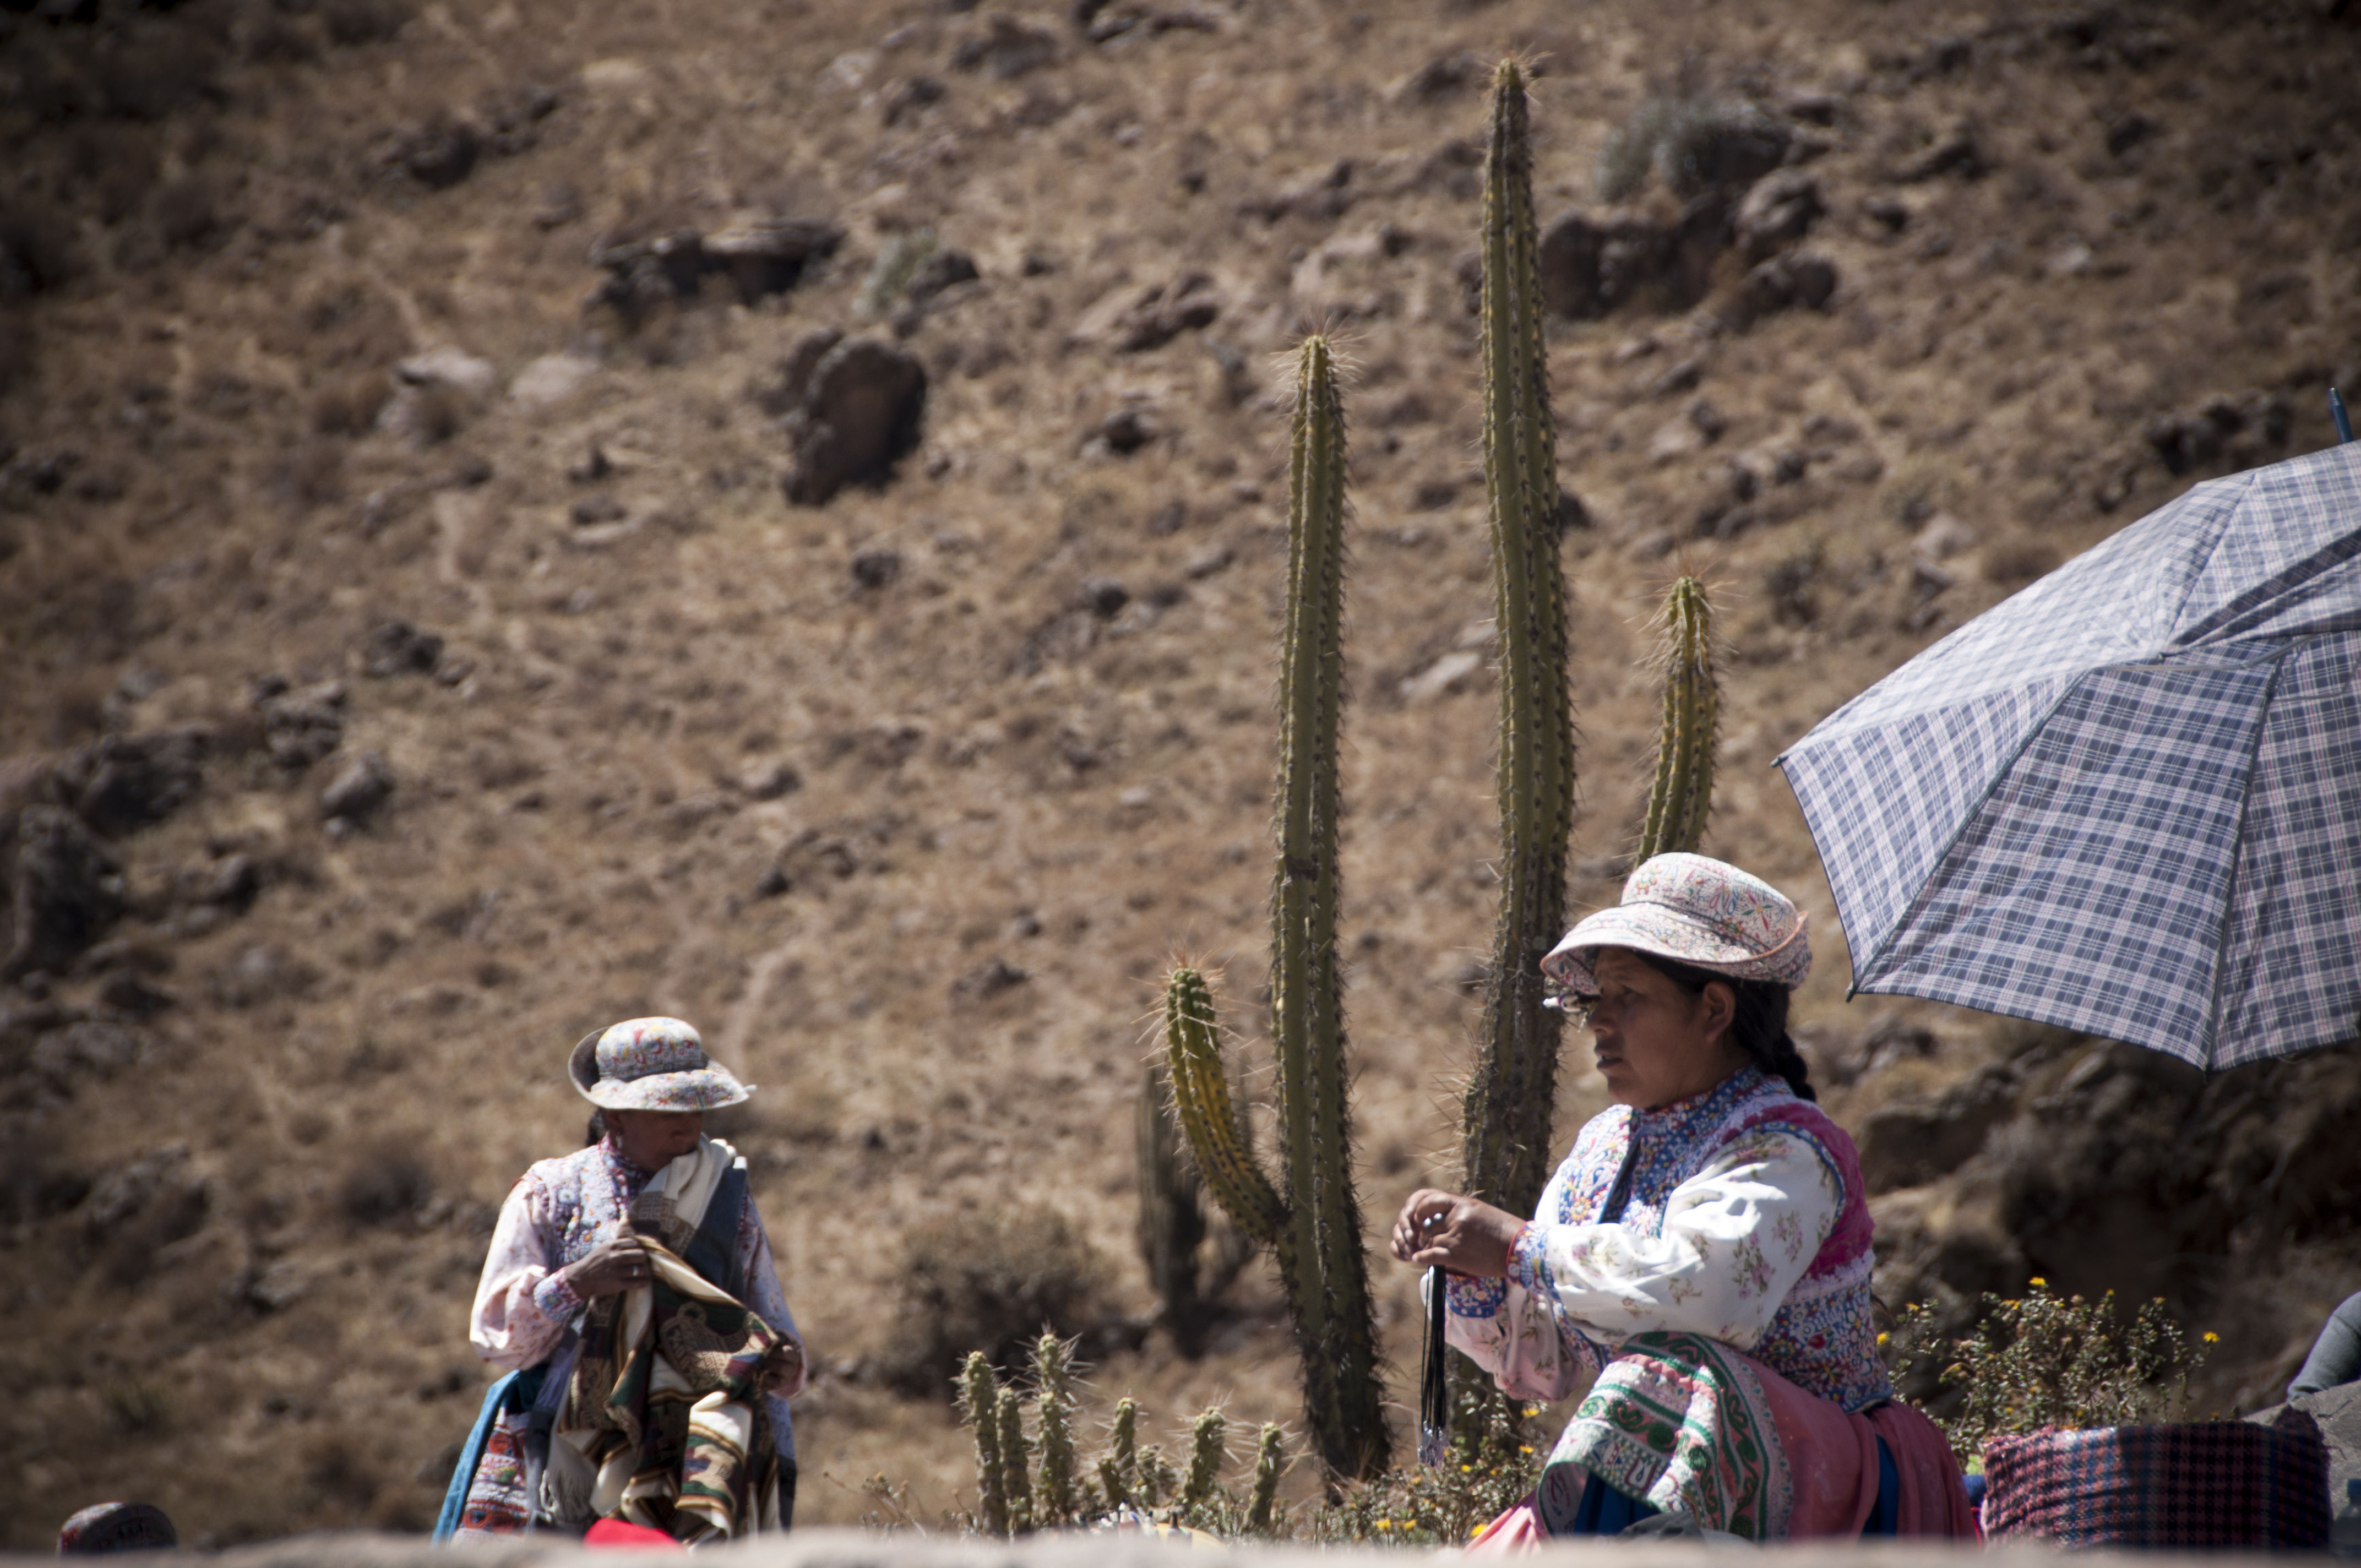 Peru 2013 Cañon del Colca Mirador del condor3